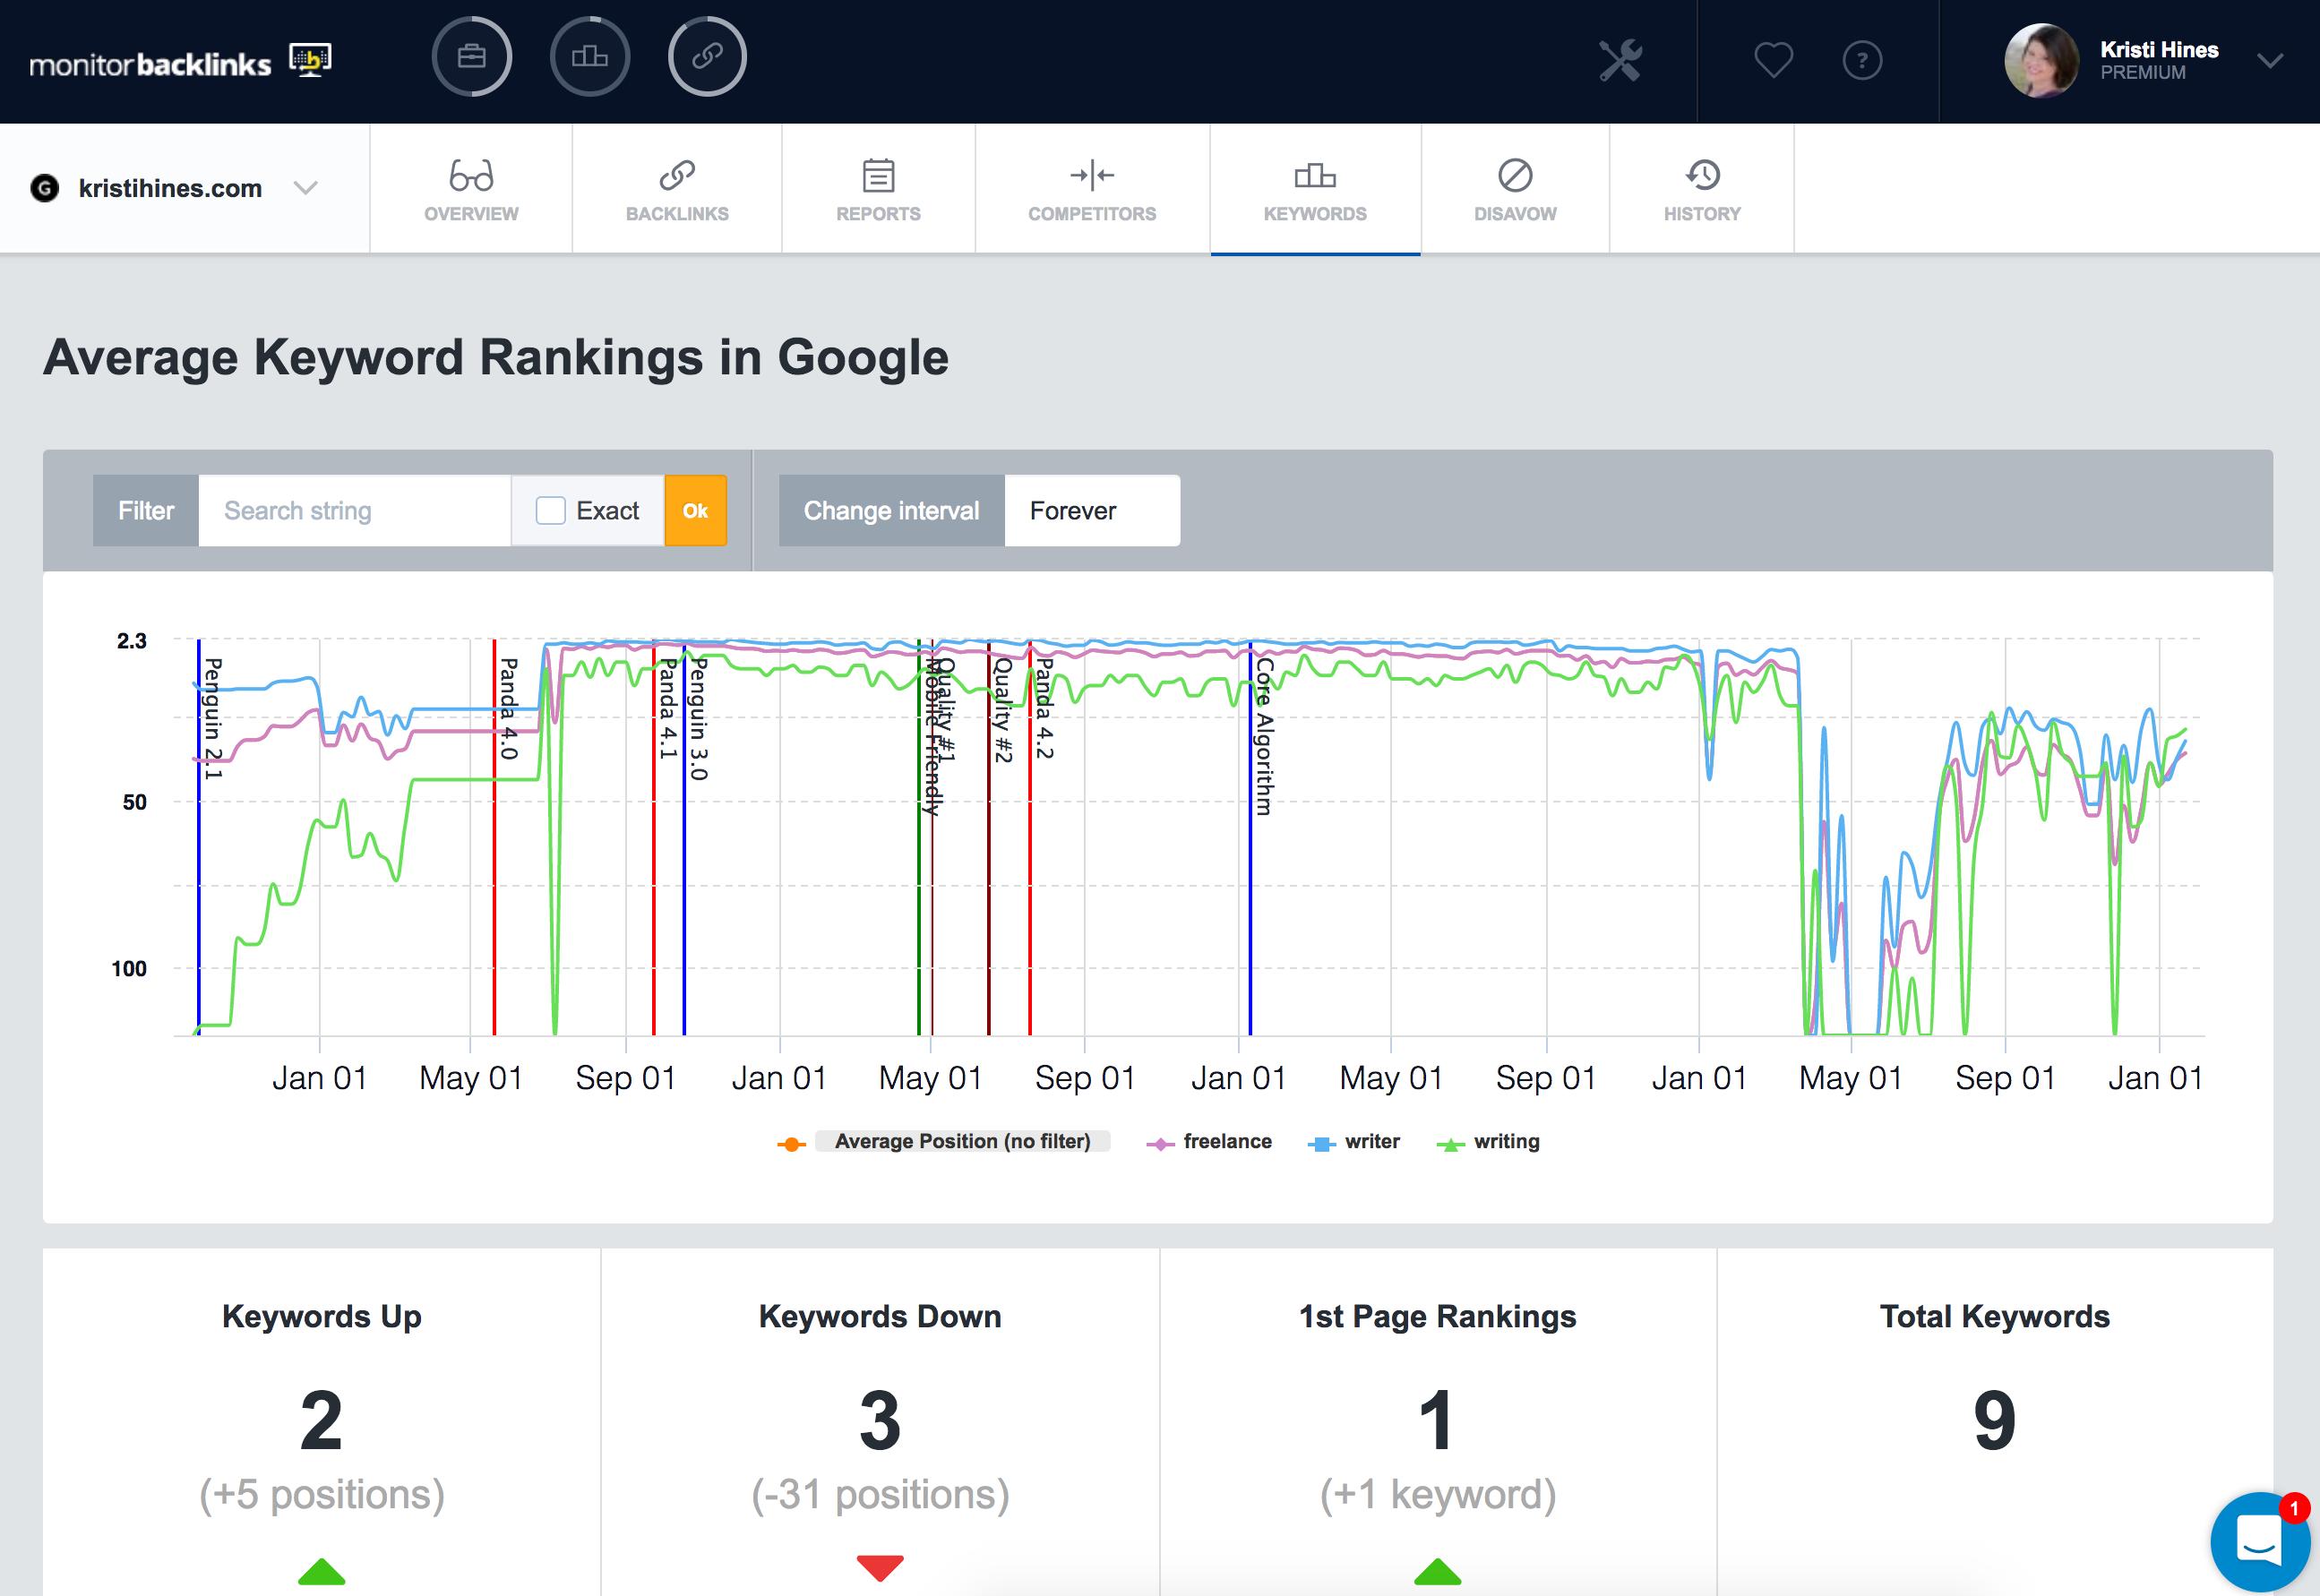 SEO Tools Software Comparison - Monitor Backlinks